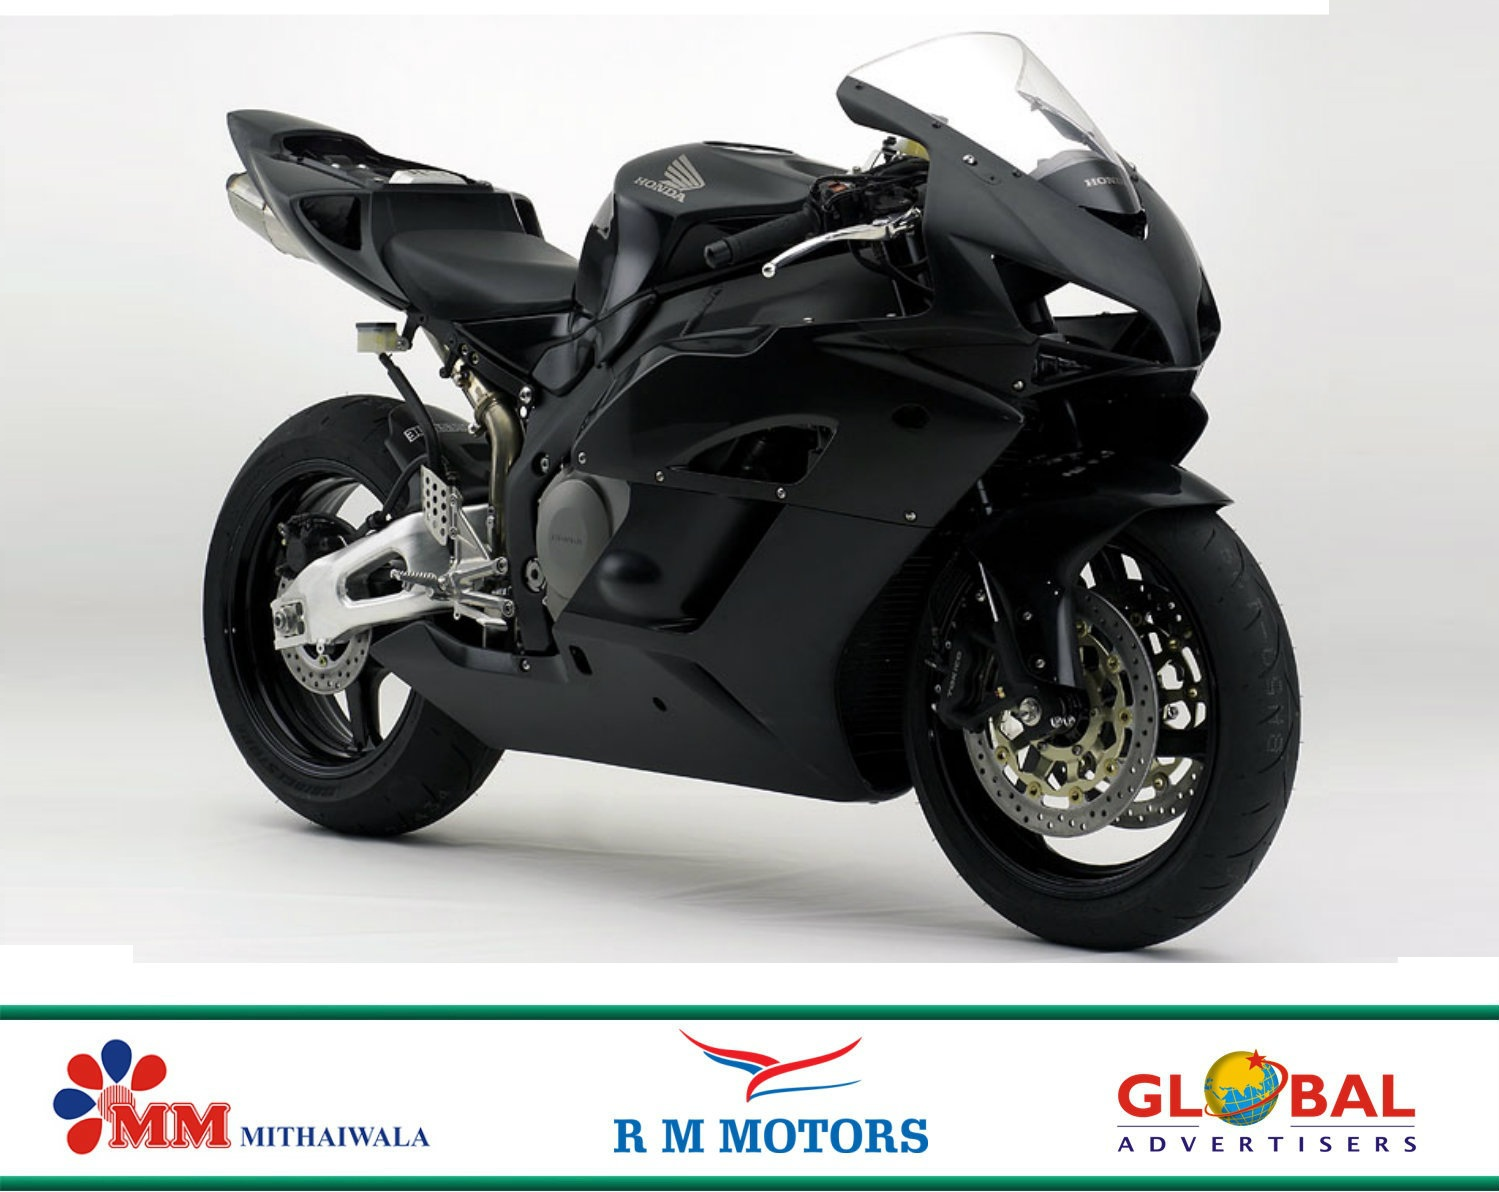 Honda Bike Price In Mumbai R M Motors Best Motorcycle Dealers